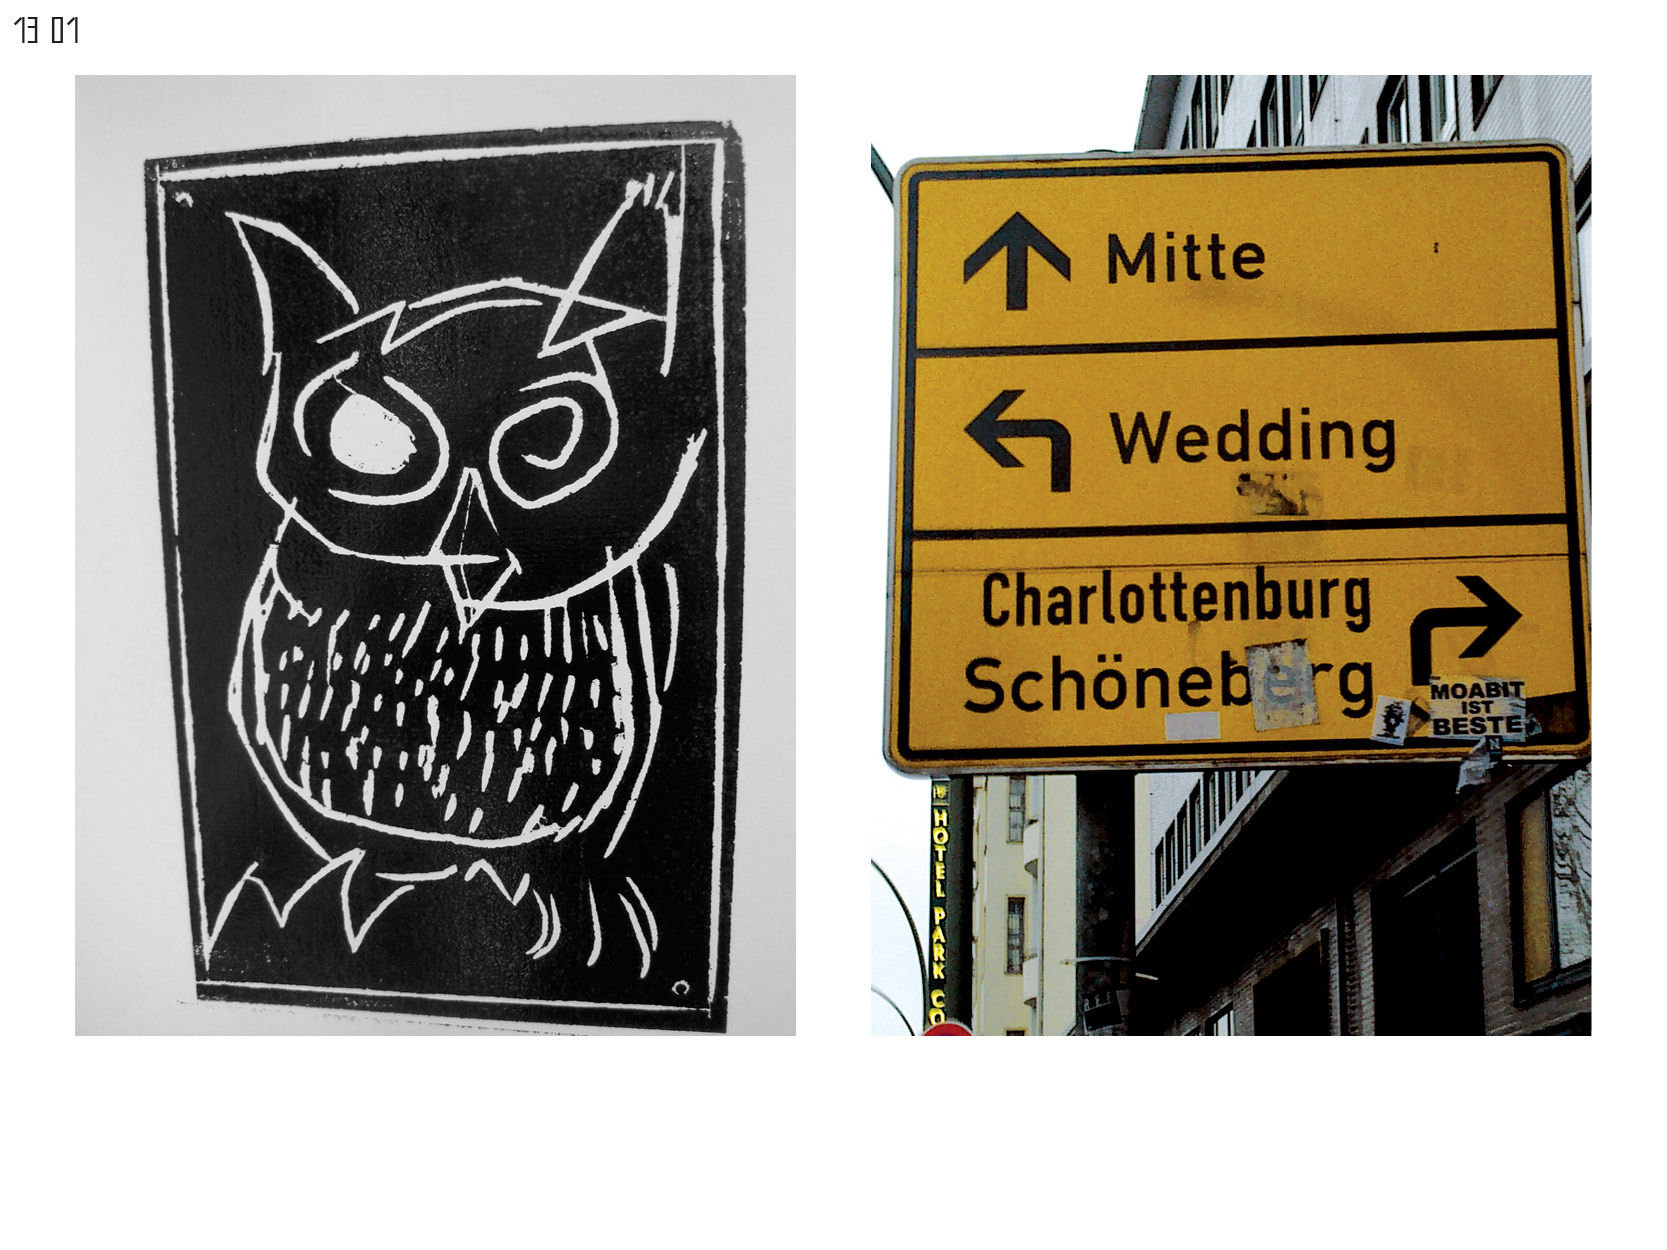 Gerrit-Schweiger-Dialog-Städte-Paris-Berlin-Jessica-Blank-Experiment-Fotoserie-Tagebuch-visuelle-Kommunikation-74